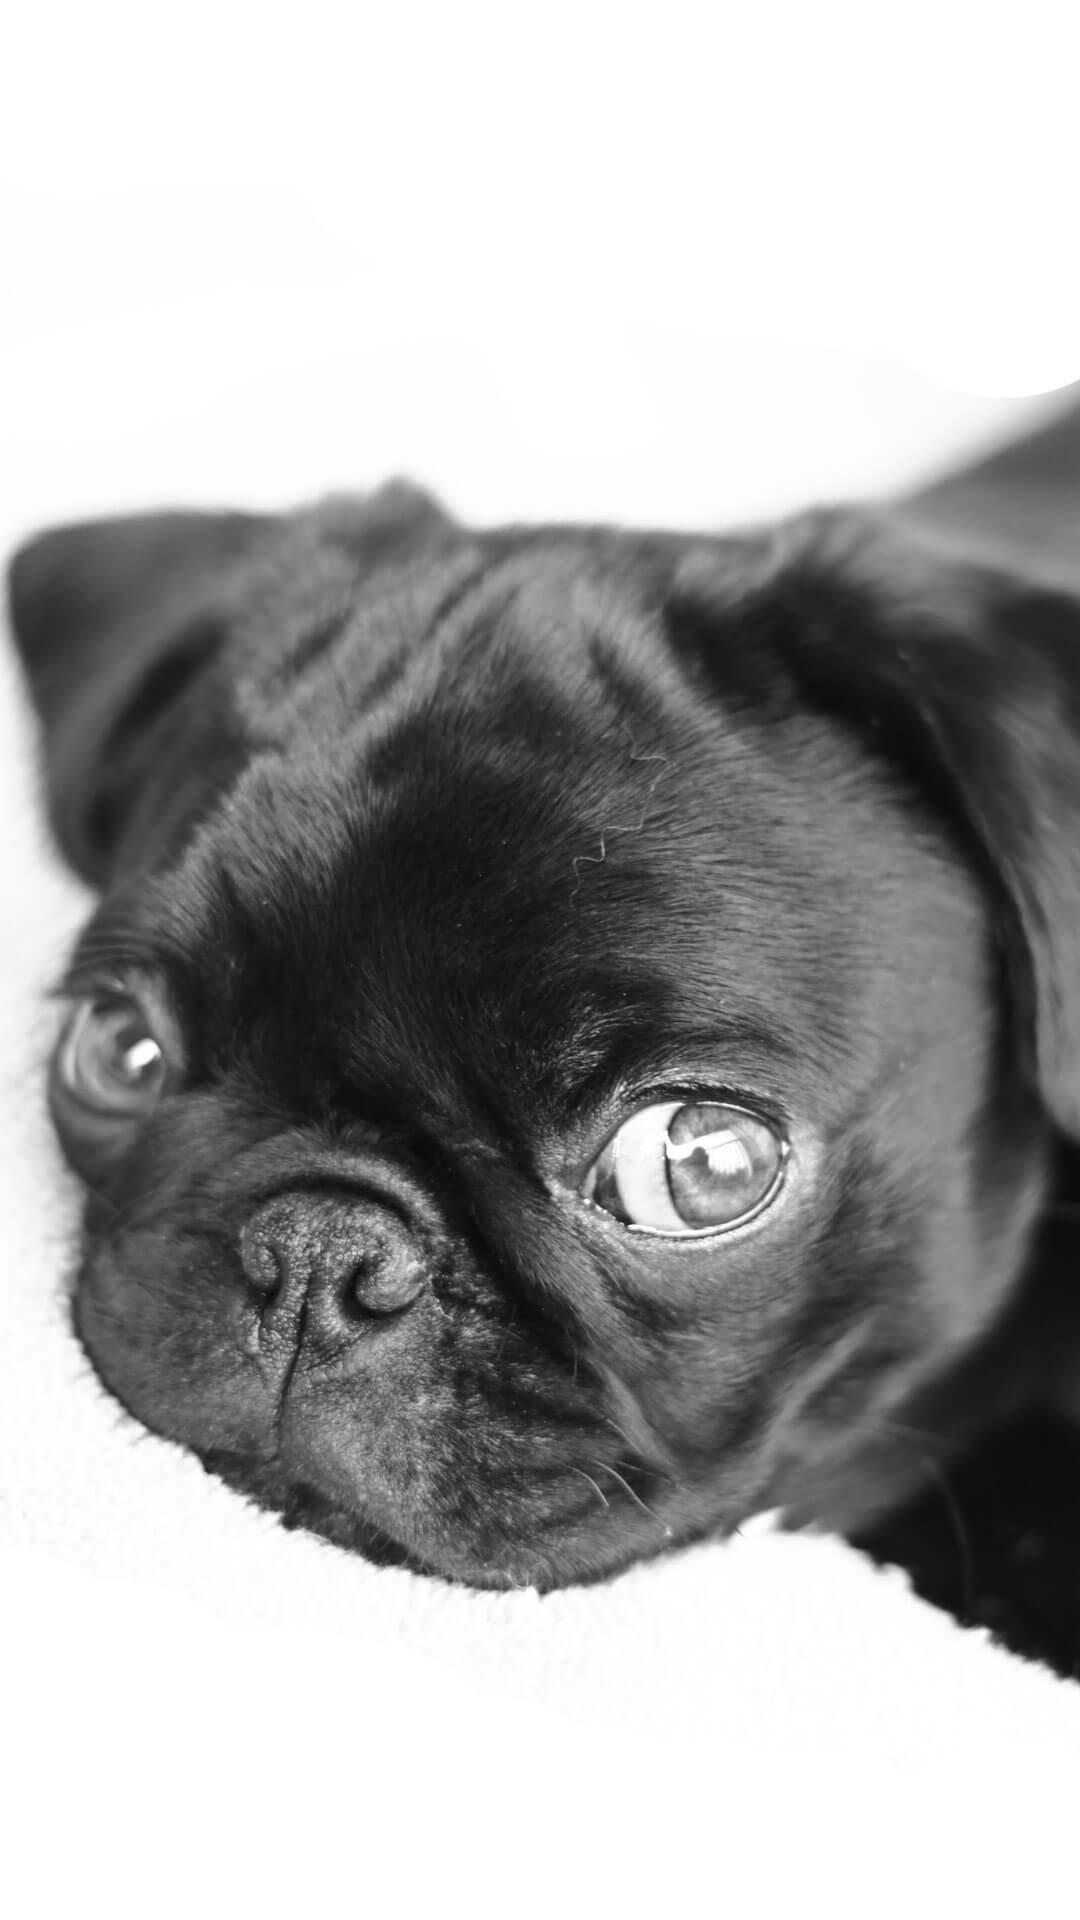 Cute Pugs Puppies iPhone 6 Wallpaper HD